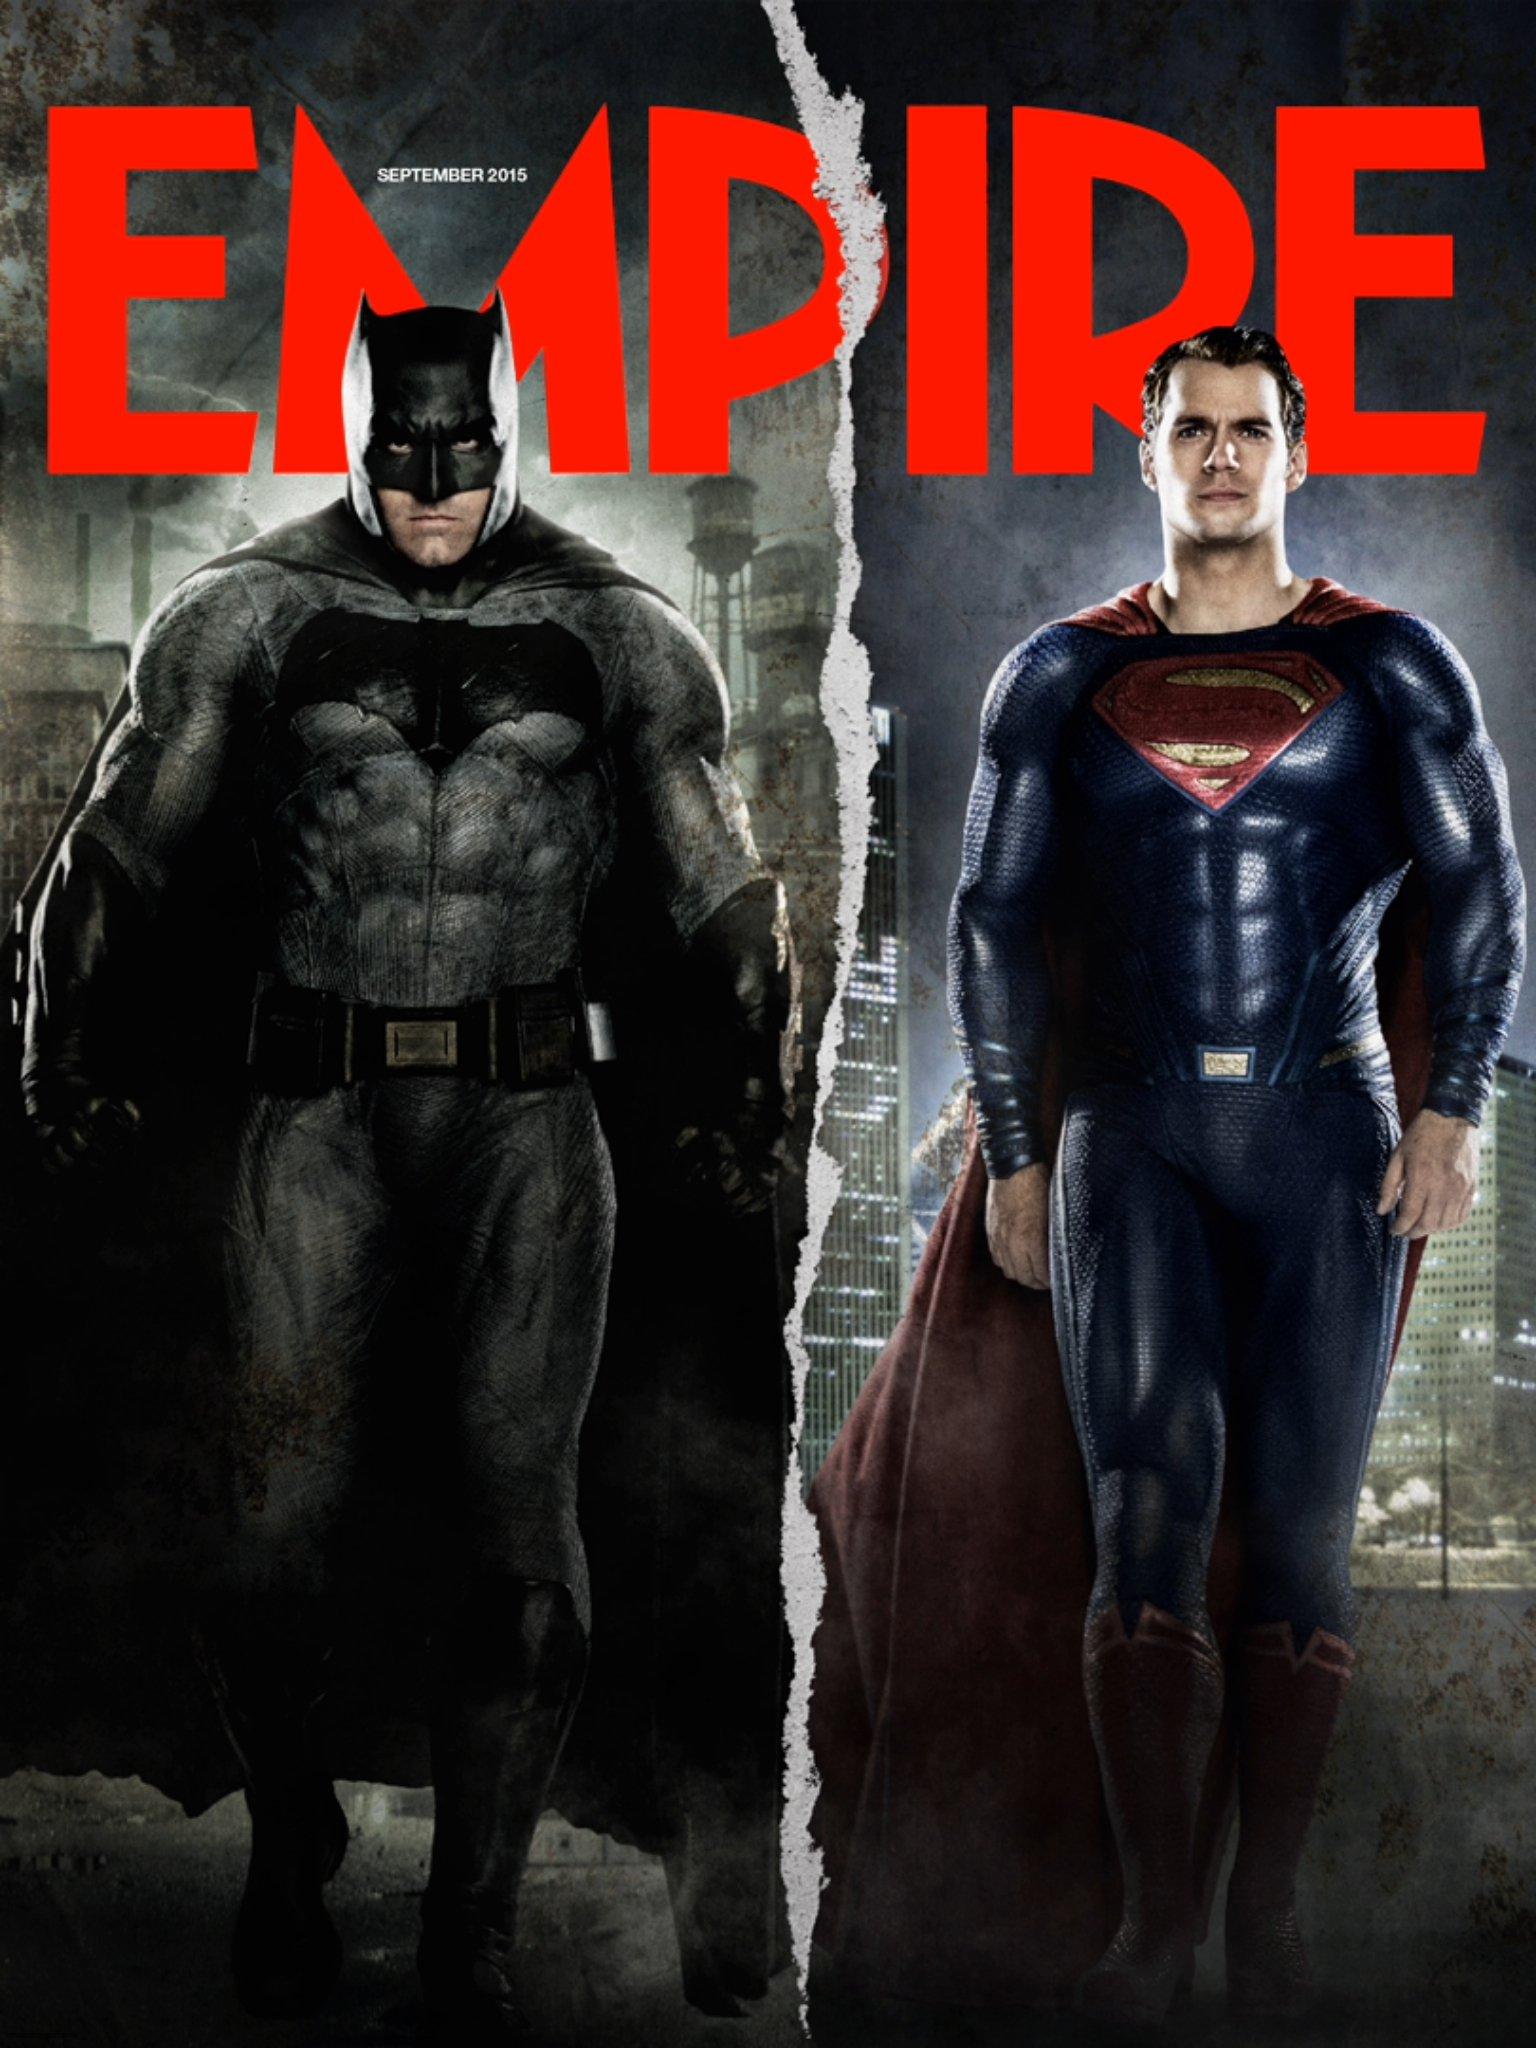 "batman vs superman image ben affleck henry cavill empire cover - ۱۸ نکته ای که مجله امپایر درباره فیلم ""بتمن علیه سوپرمن: طلوع عدالت"" منتشر کرده است"